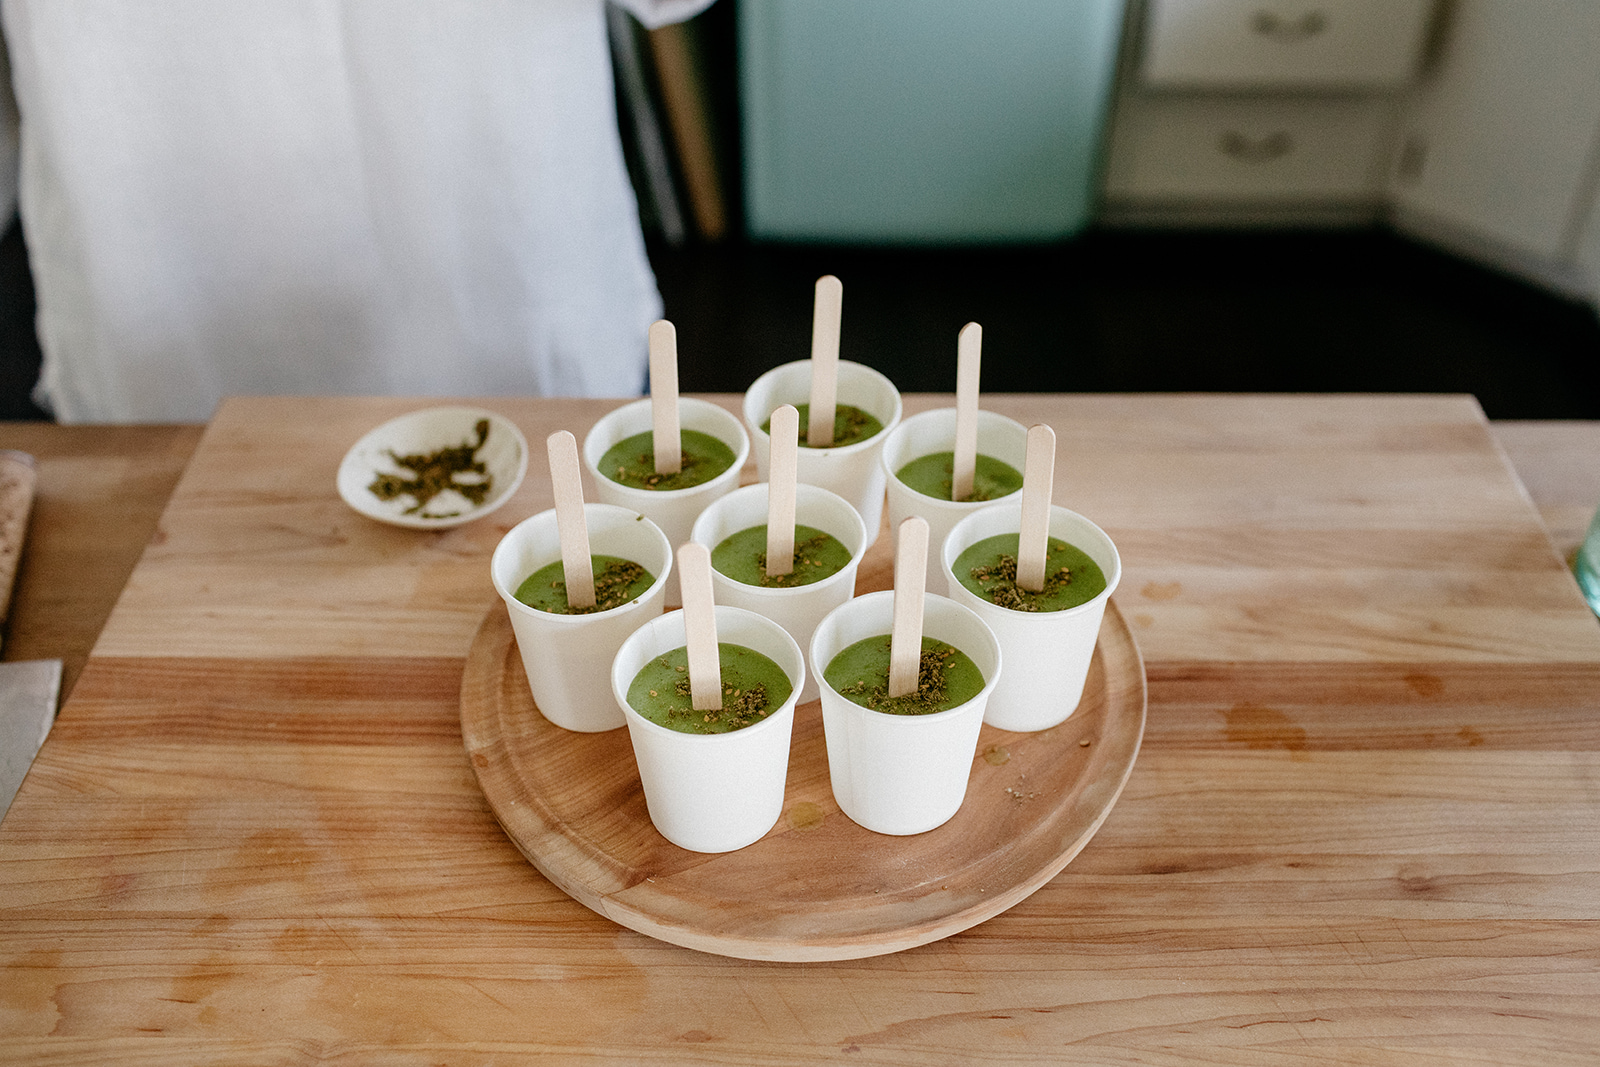 molly-yeh-prairie-organic-cucumber-popcicles-21.jpg